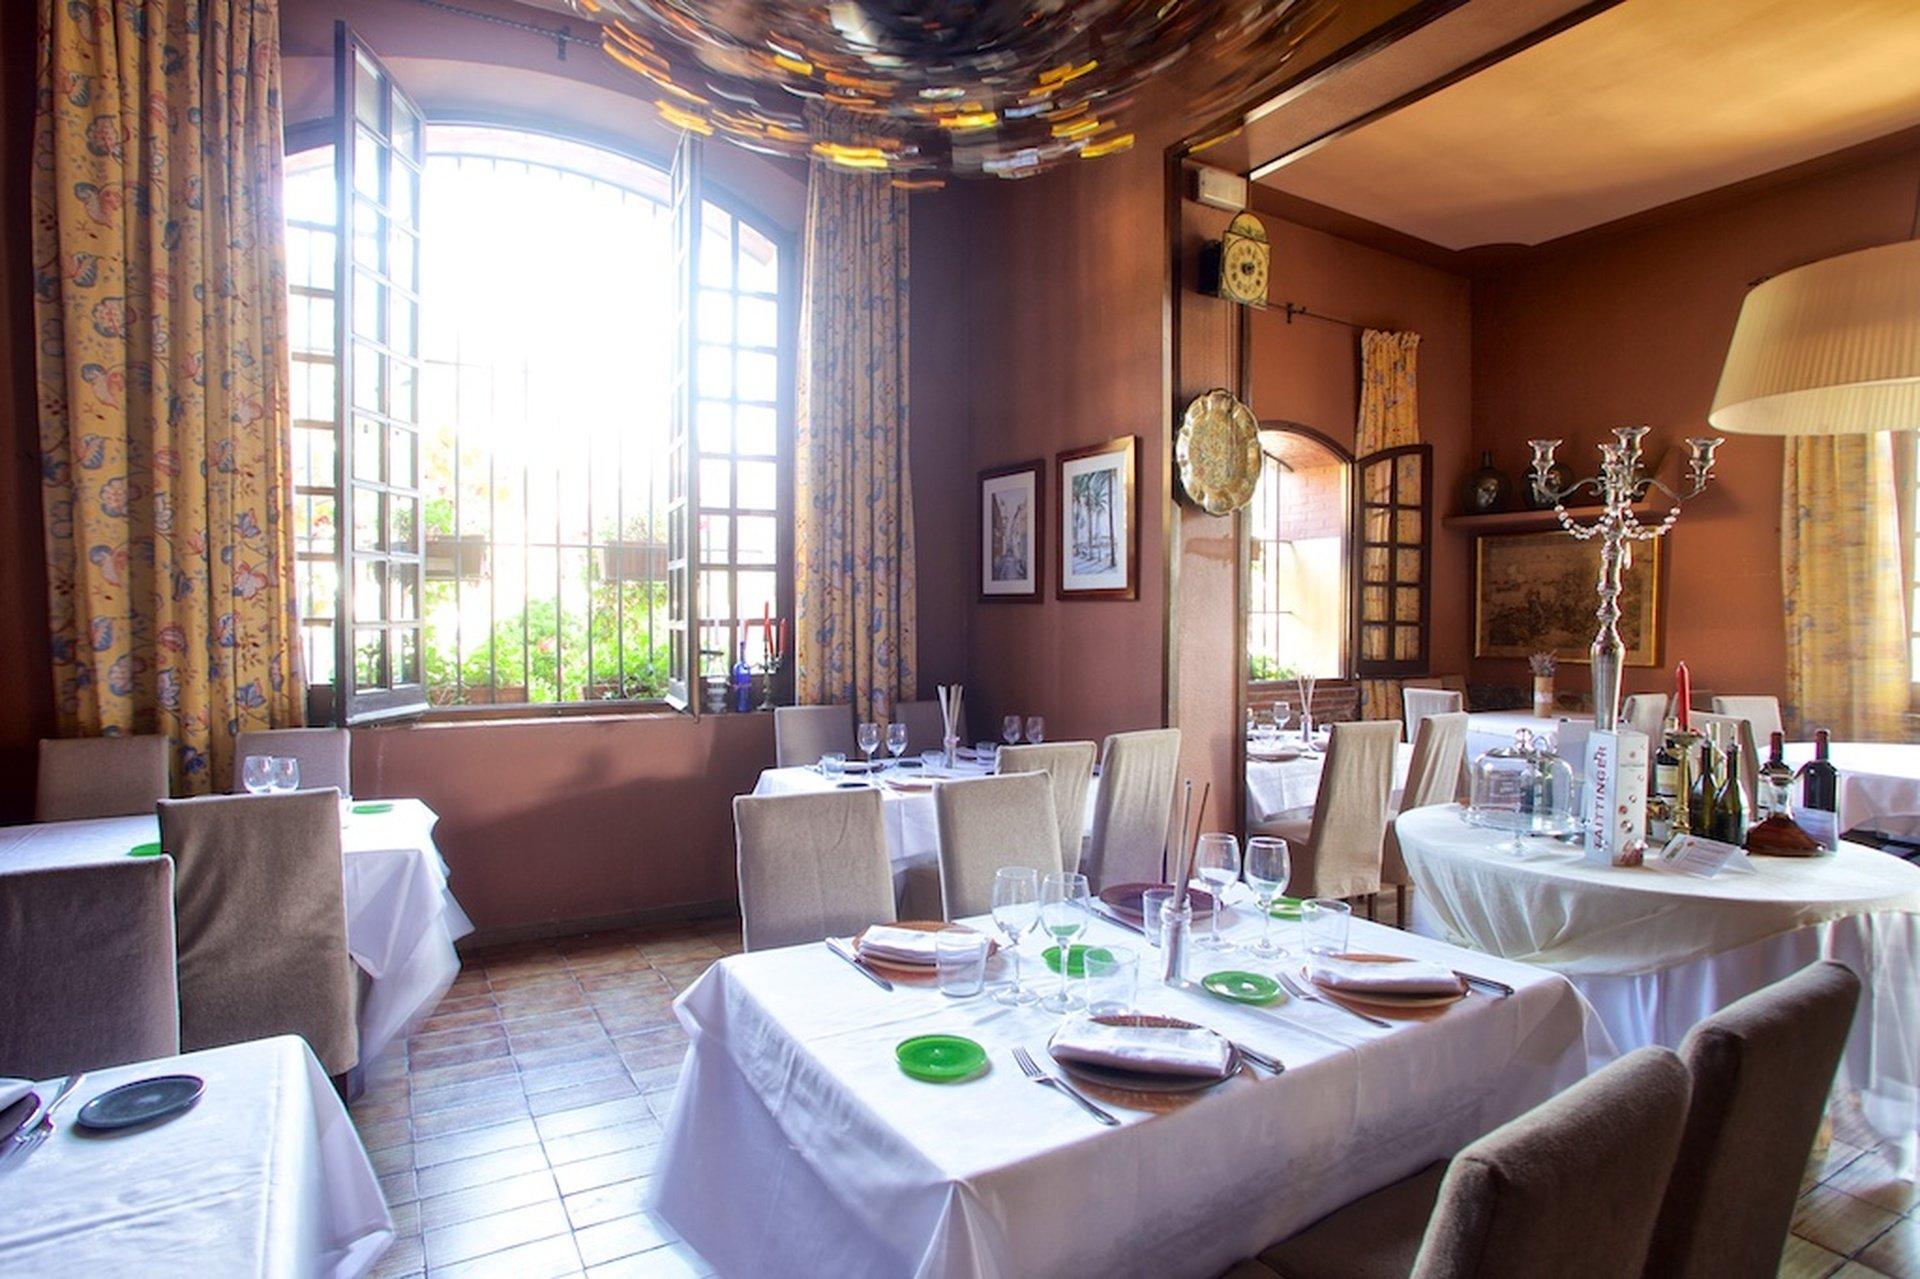 Barcelone corporate event venues Restaurant Mas Corts - Manor main floor image 0